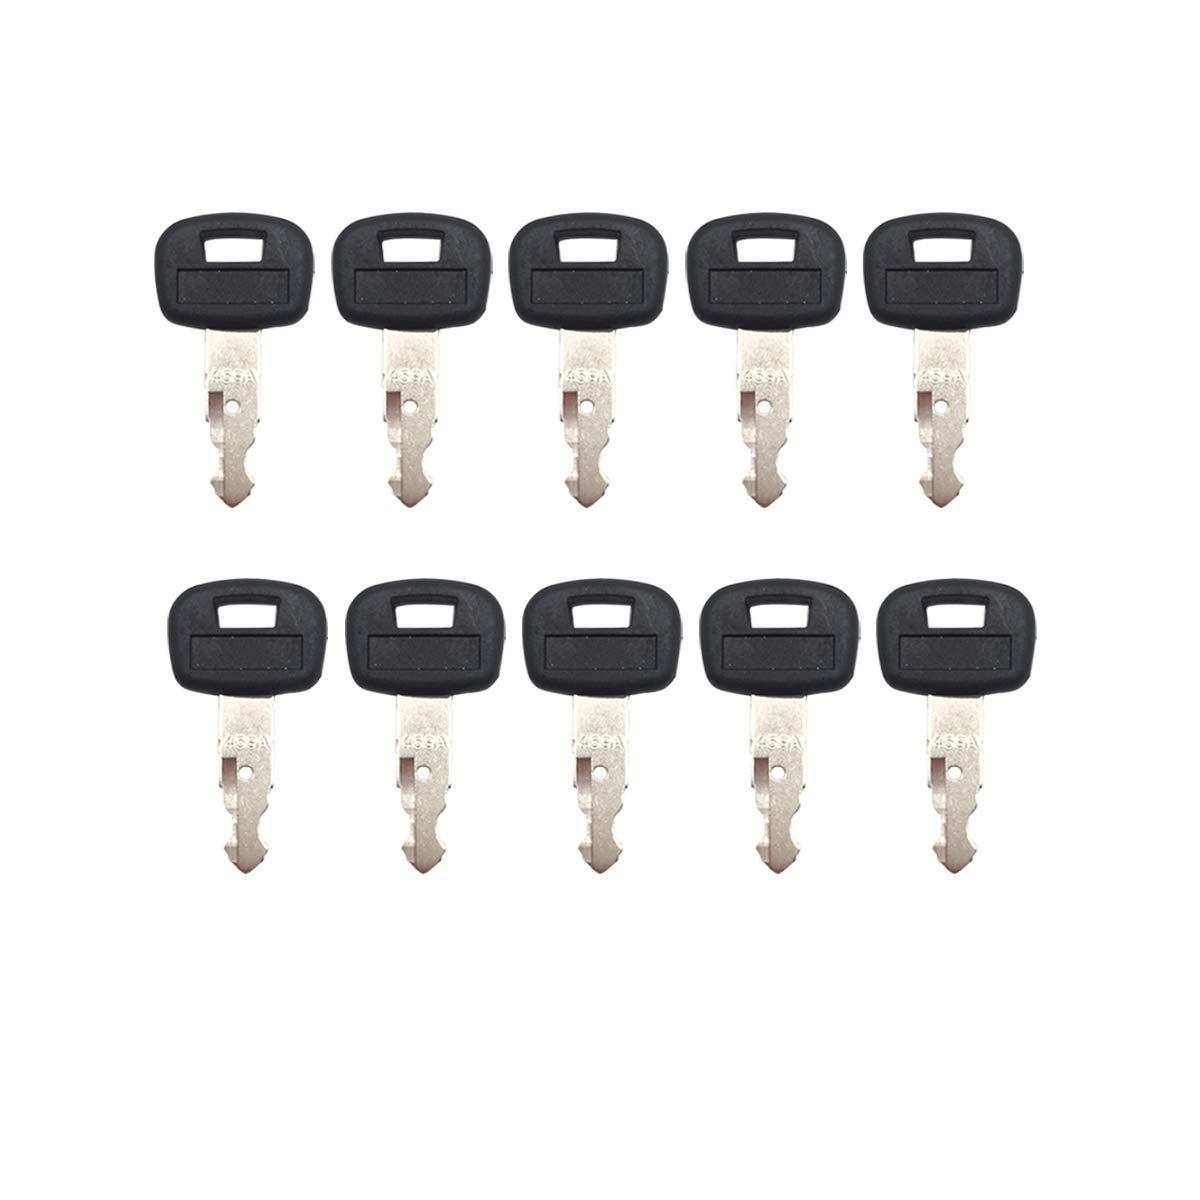 10 pcs Ignition Key RC411-53933 RC461-53930 for Kubota Excavator KX91-3 KX121-3 KX161-3 Skid Steer Loaders SSV65 SSV75